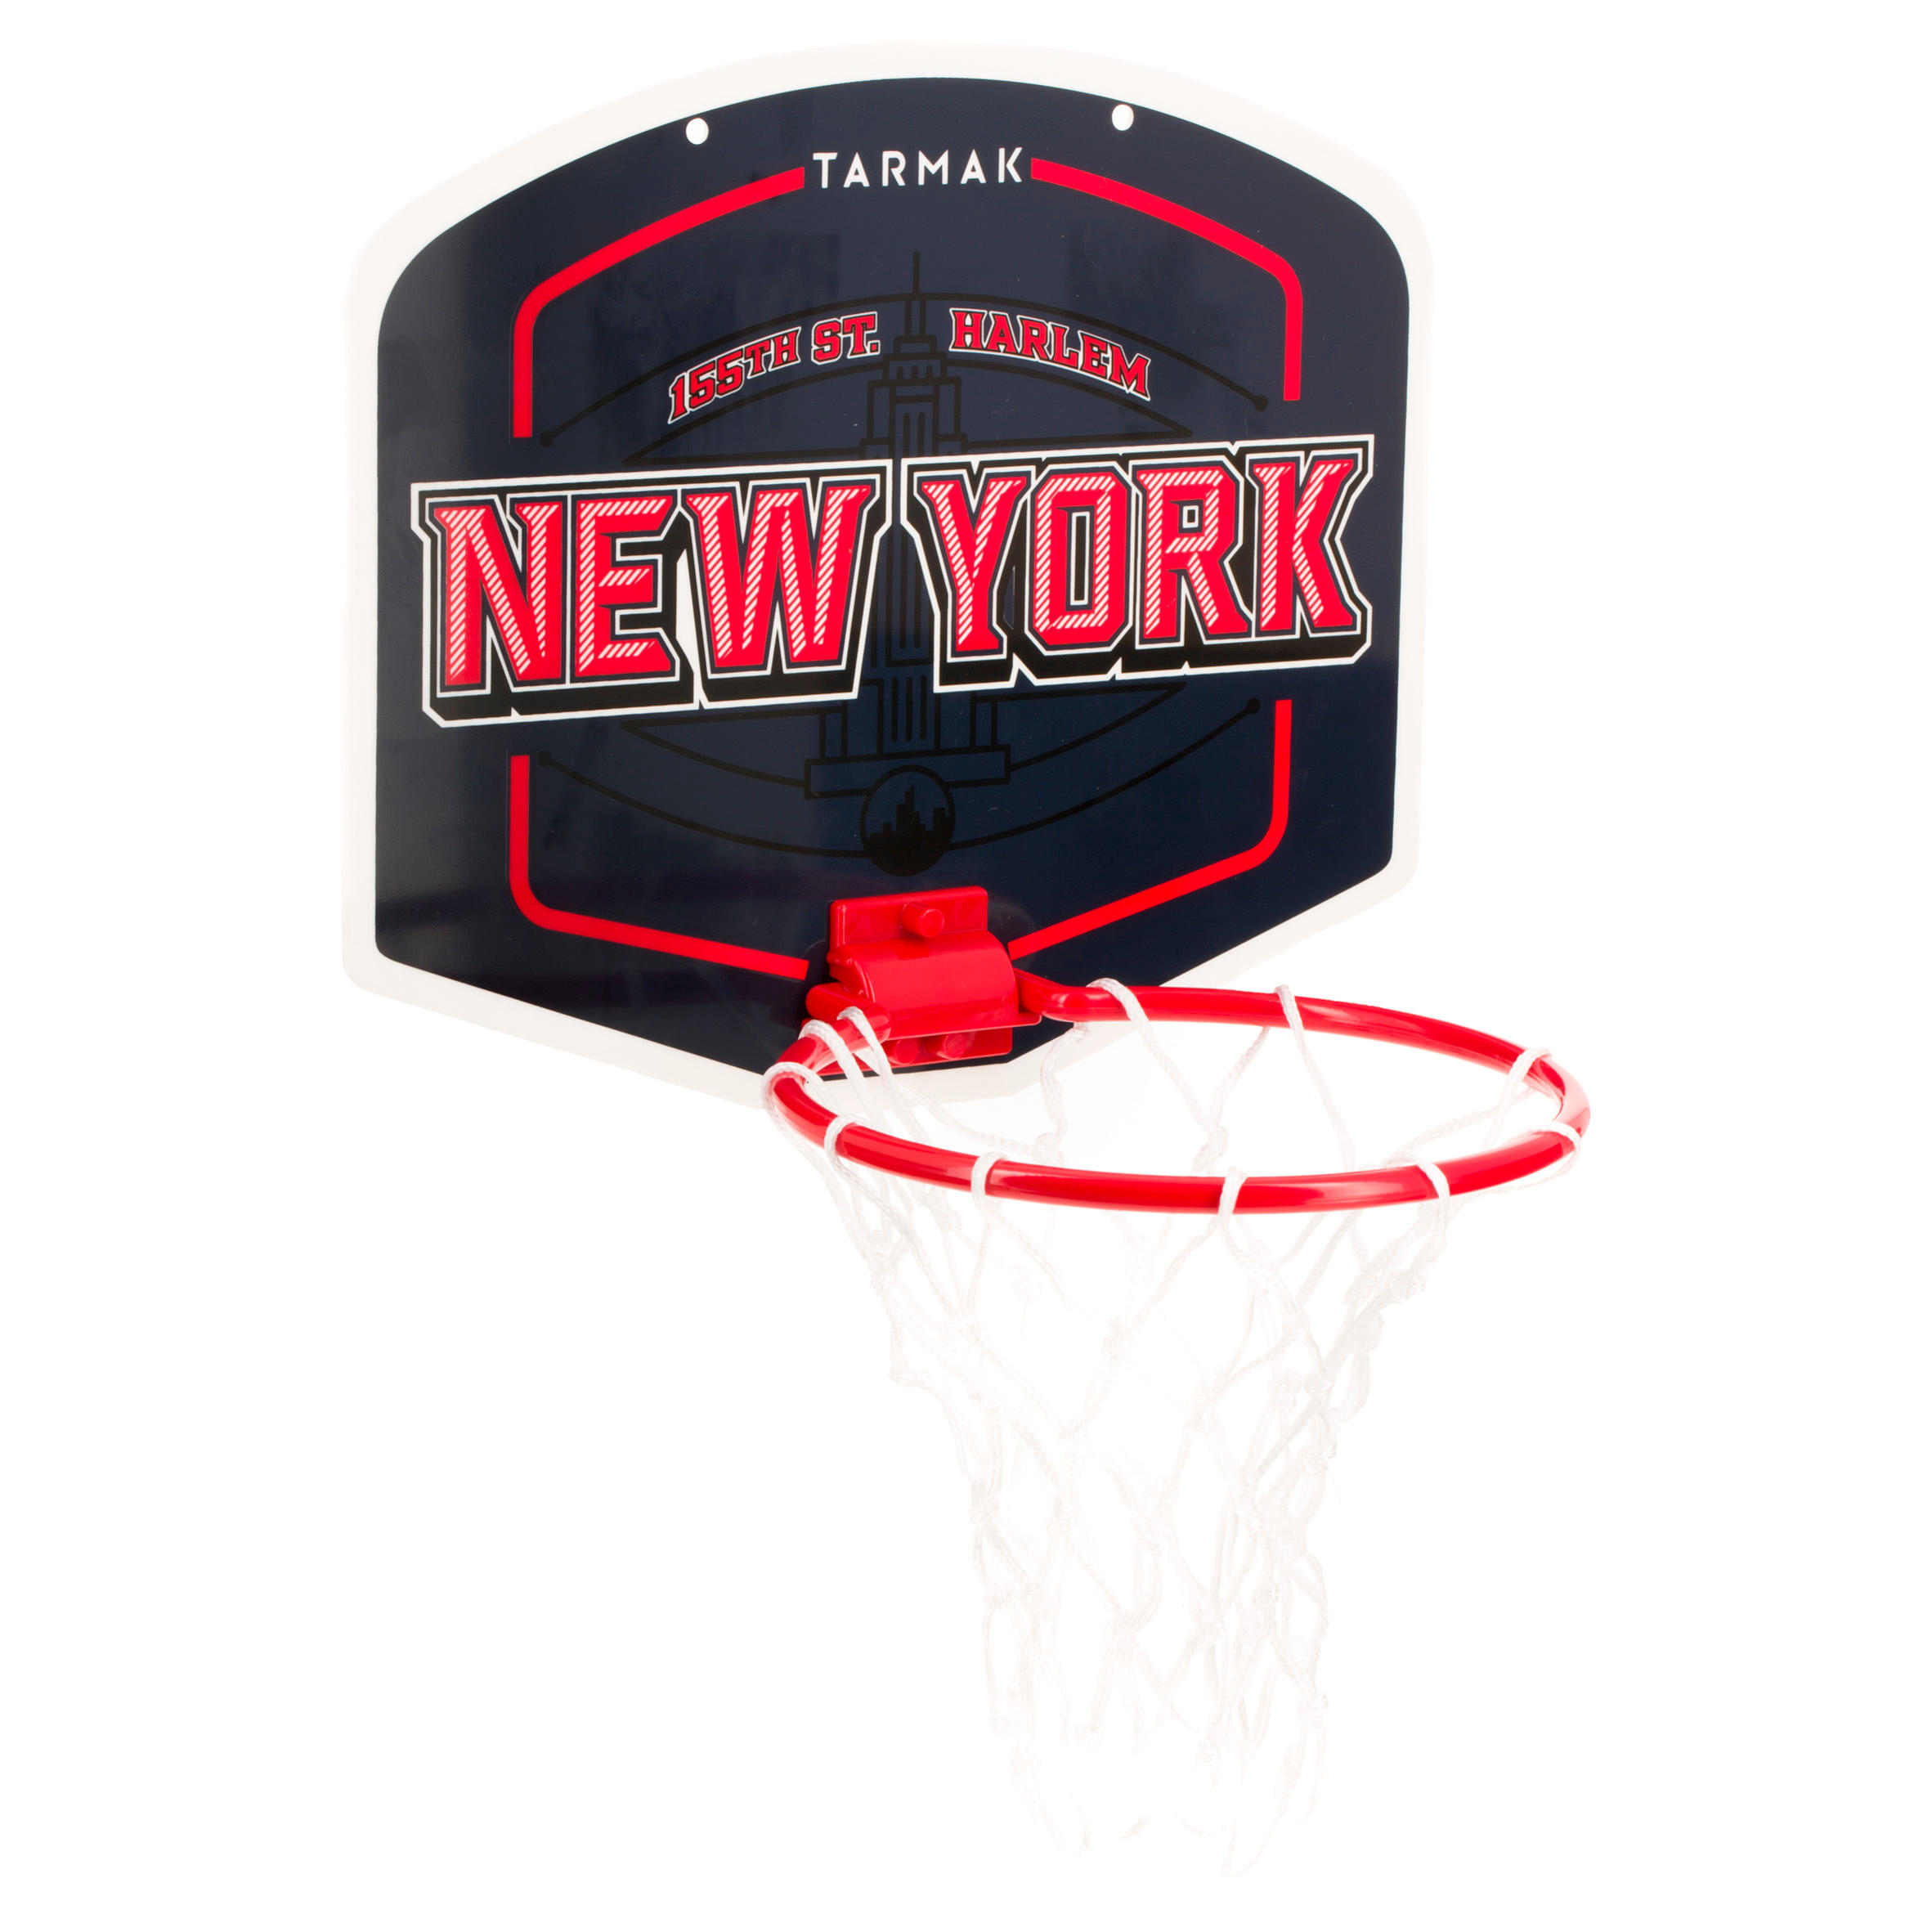 Tarmak Mini basketbalbord kinderen/volwassenen Set Mini B New York blauw. Incl. bal.